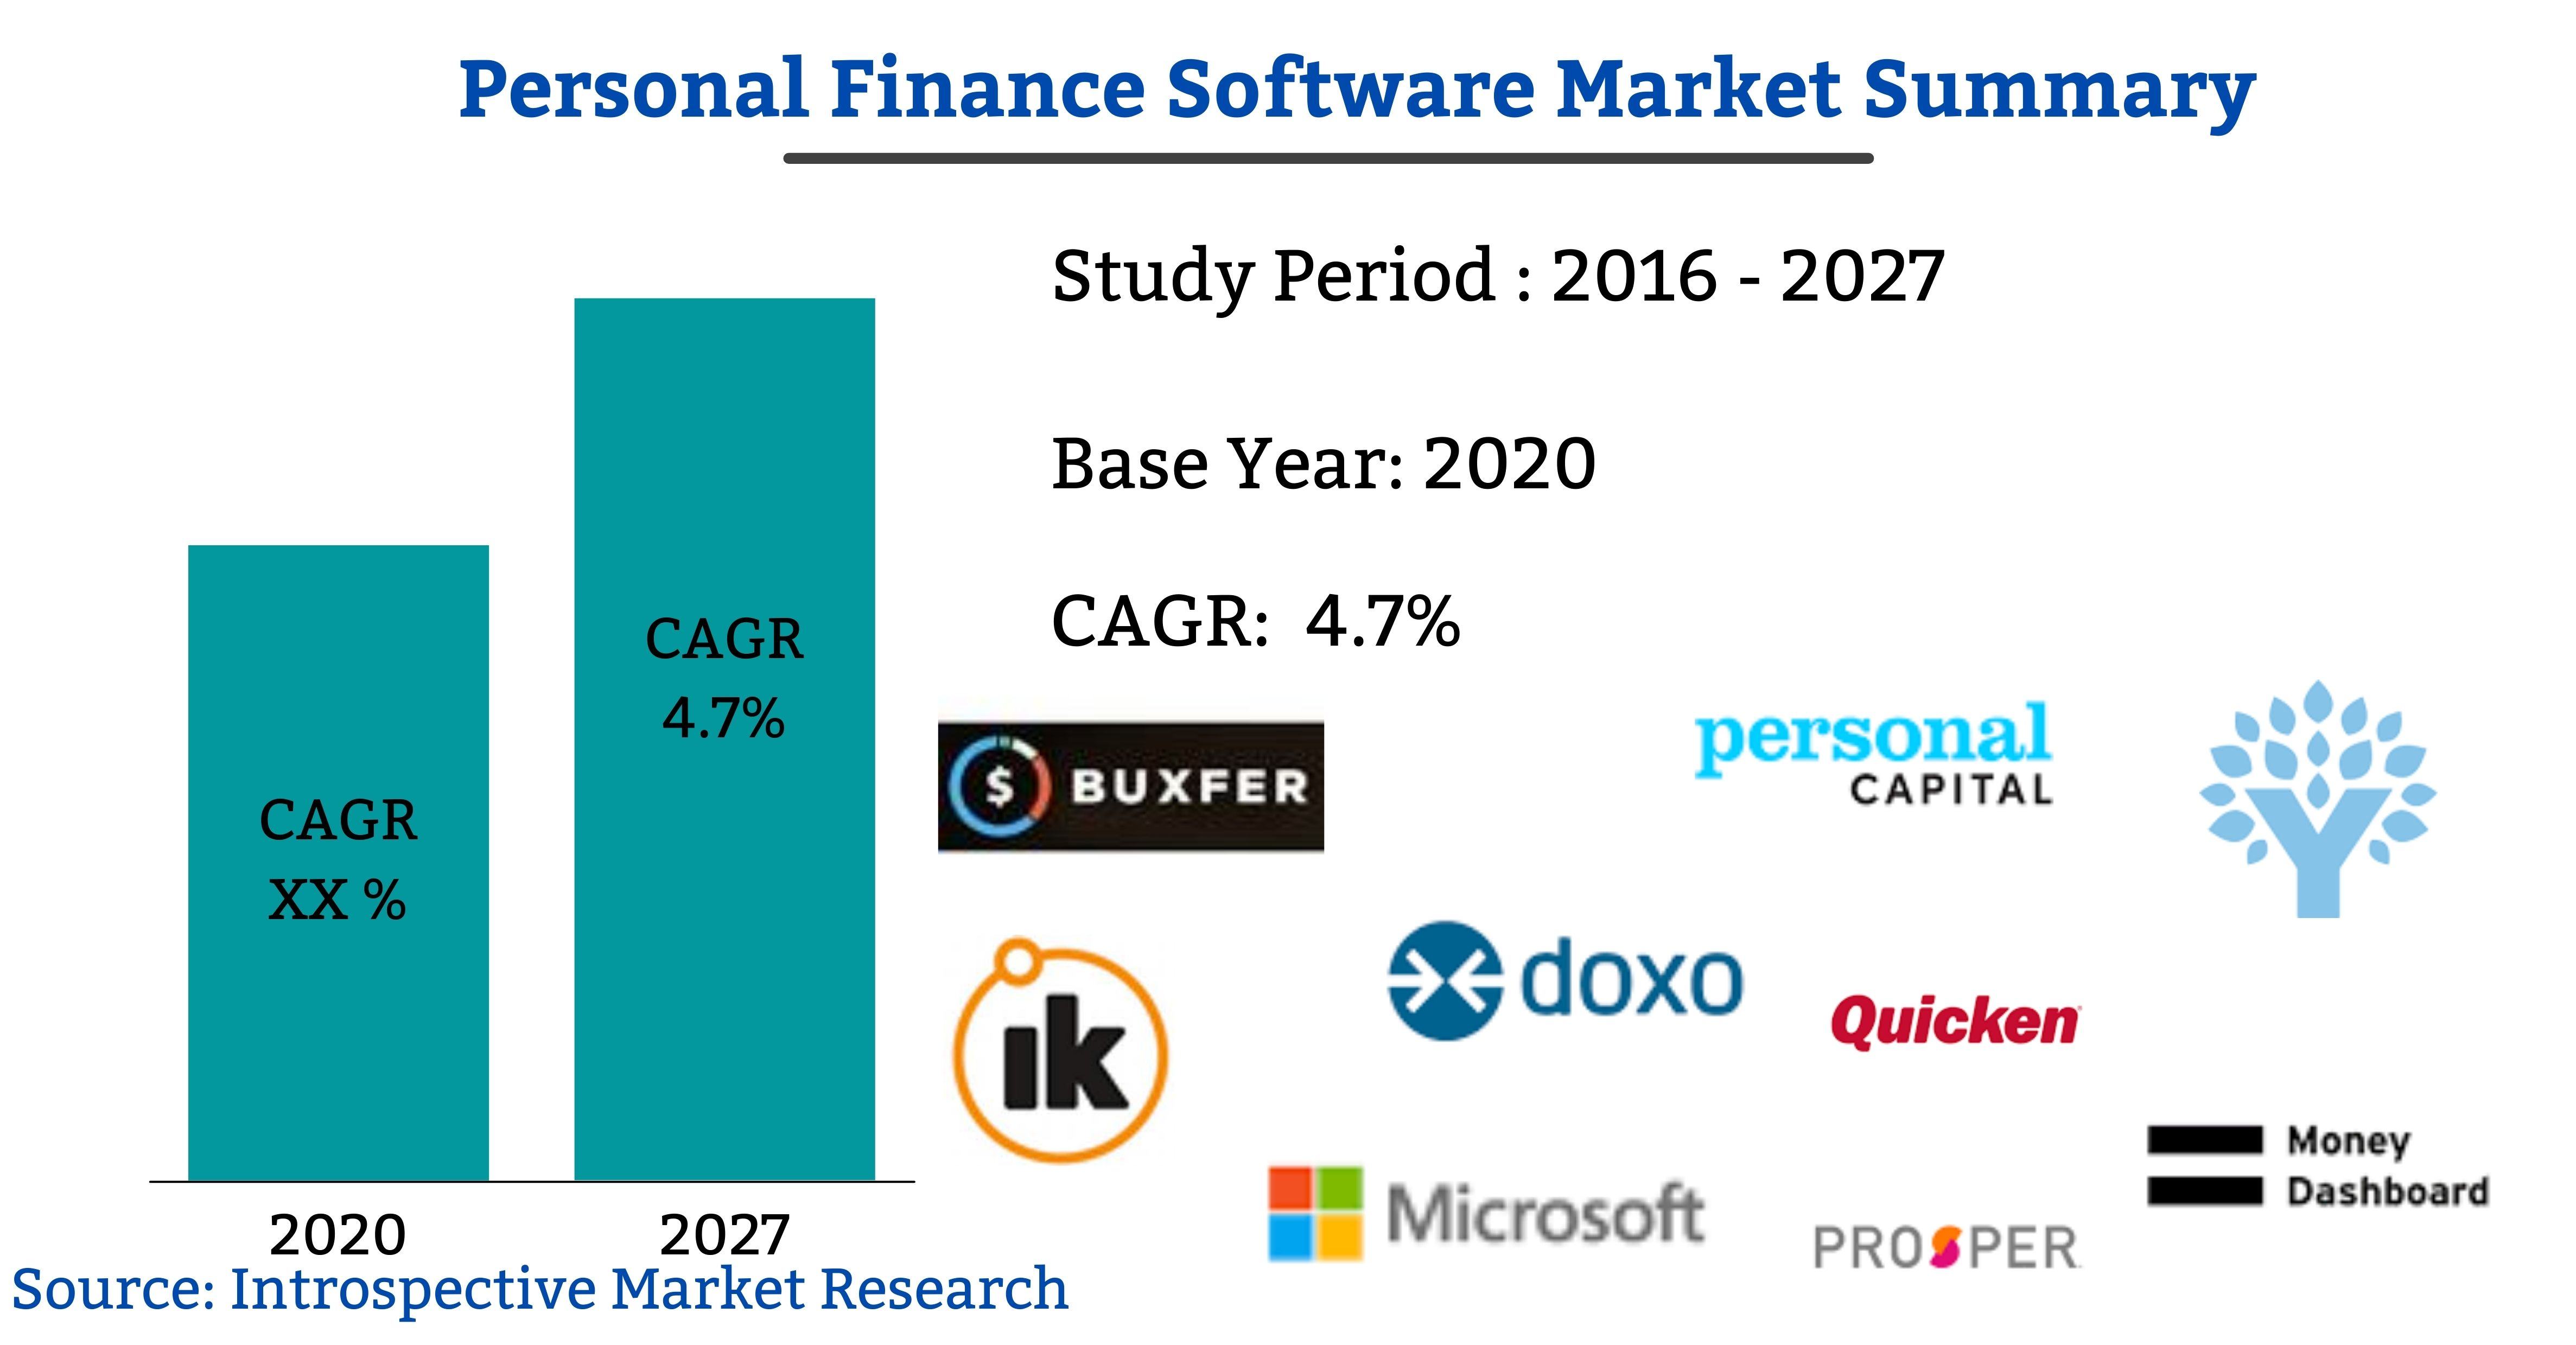 Personal Finance Software Market